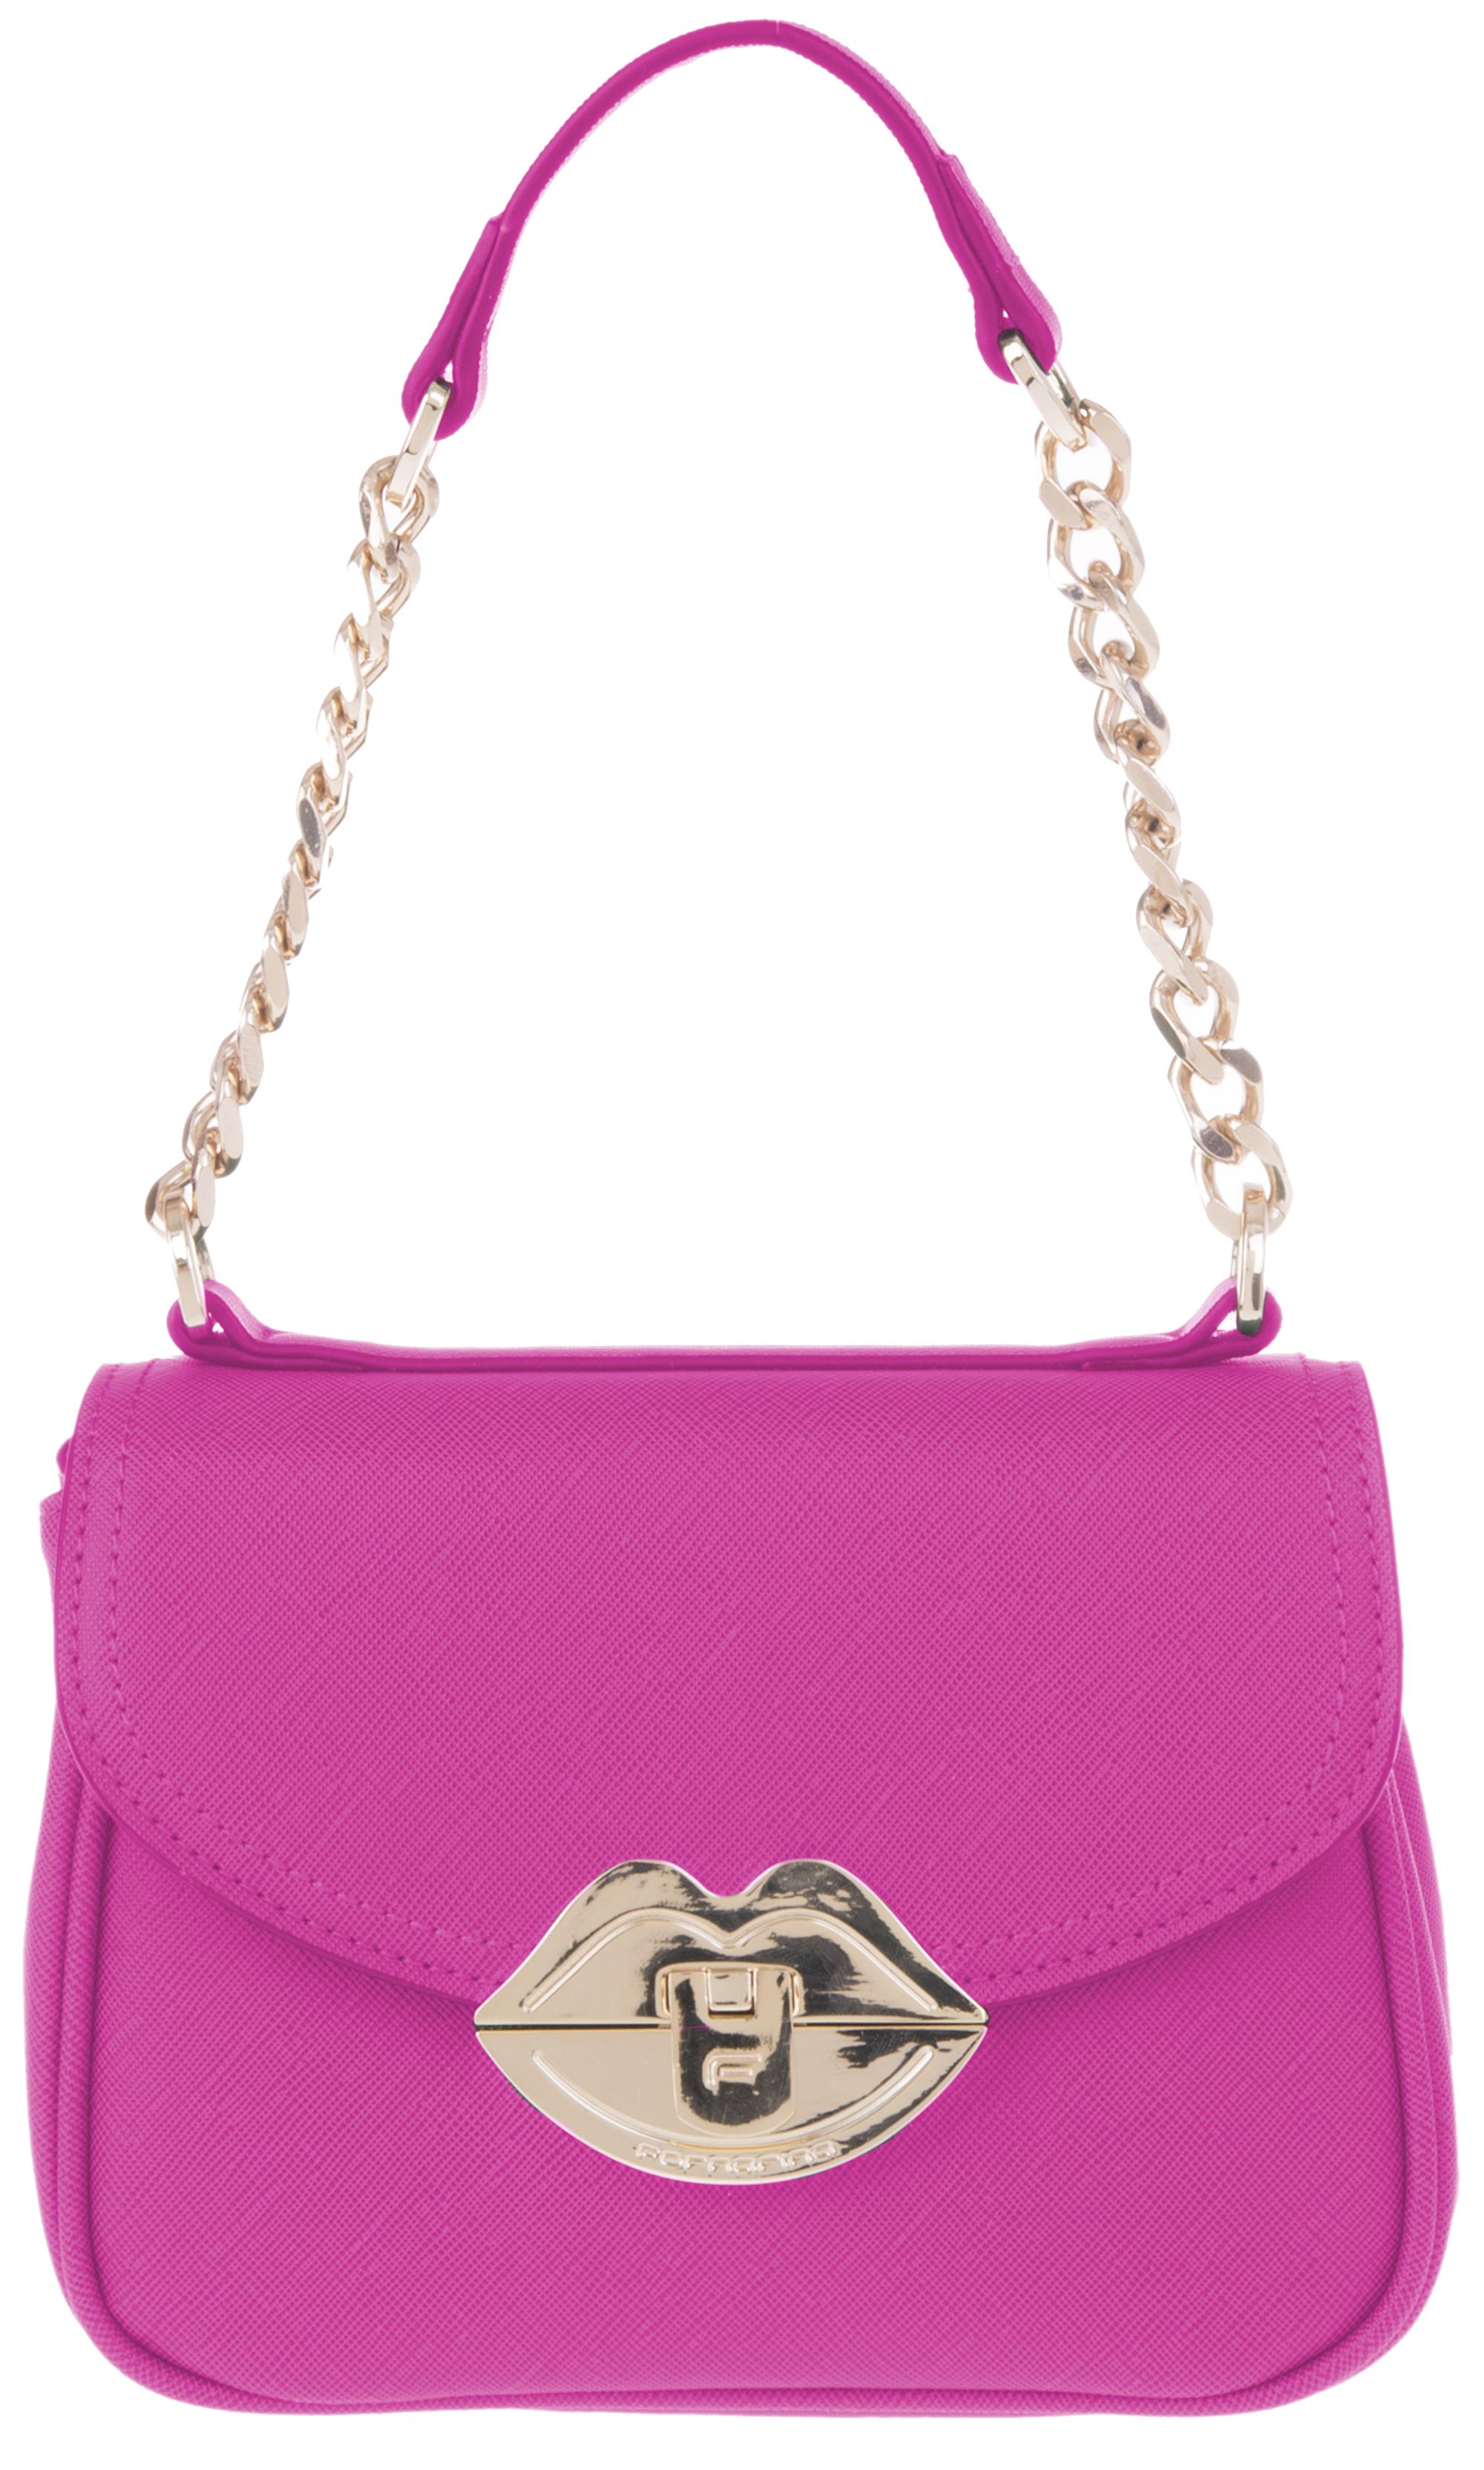 51c4b5b96e34b Fornarina Damentasche Iris Pink Saffiano